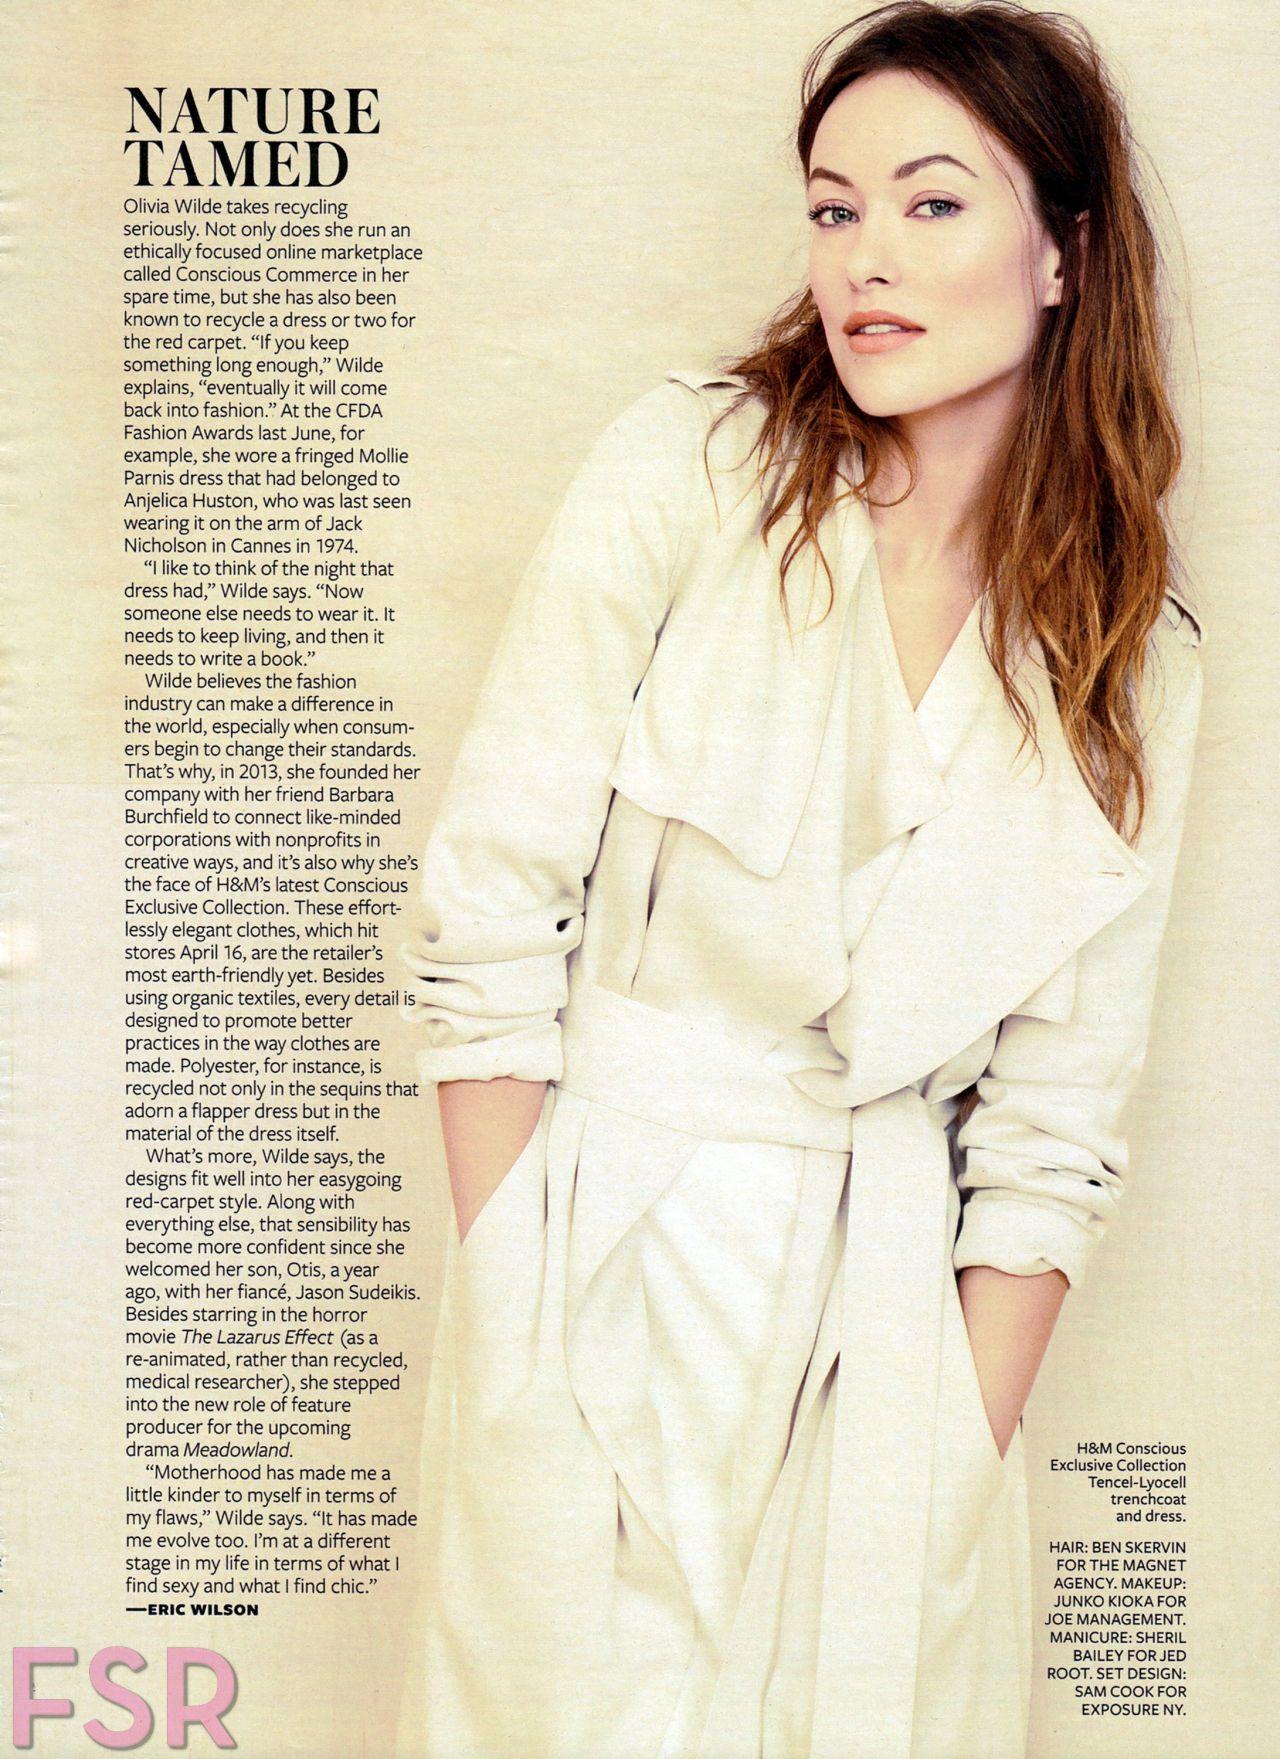 Olivia Wilde 2015 Celebrity Photos Instyle Magazine April Issue